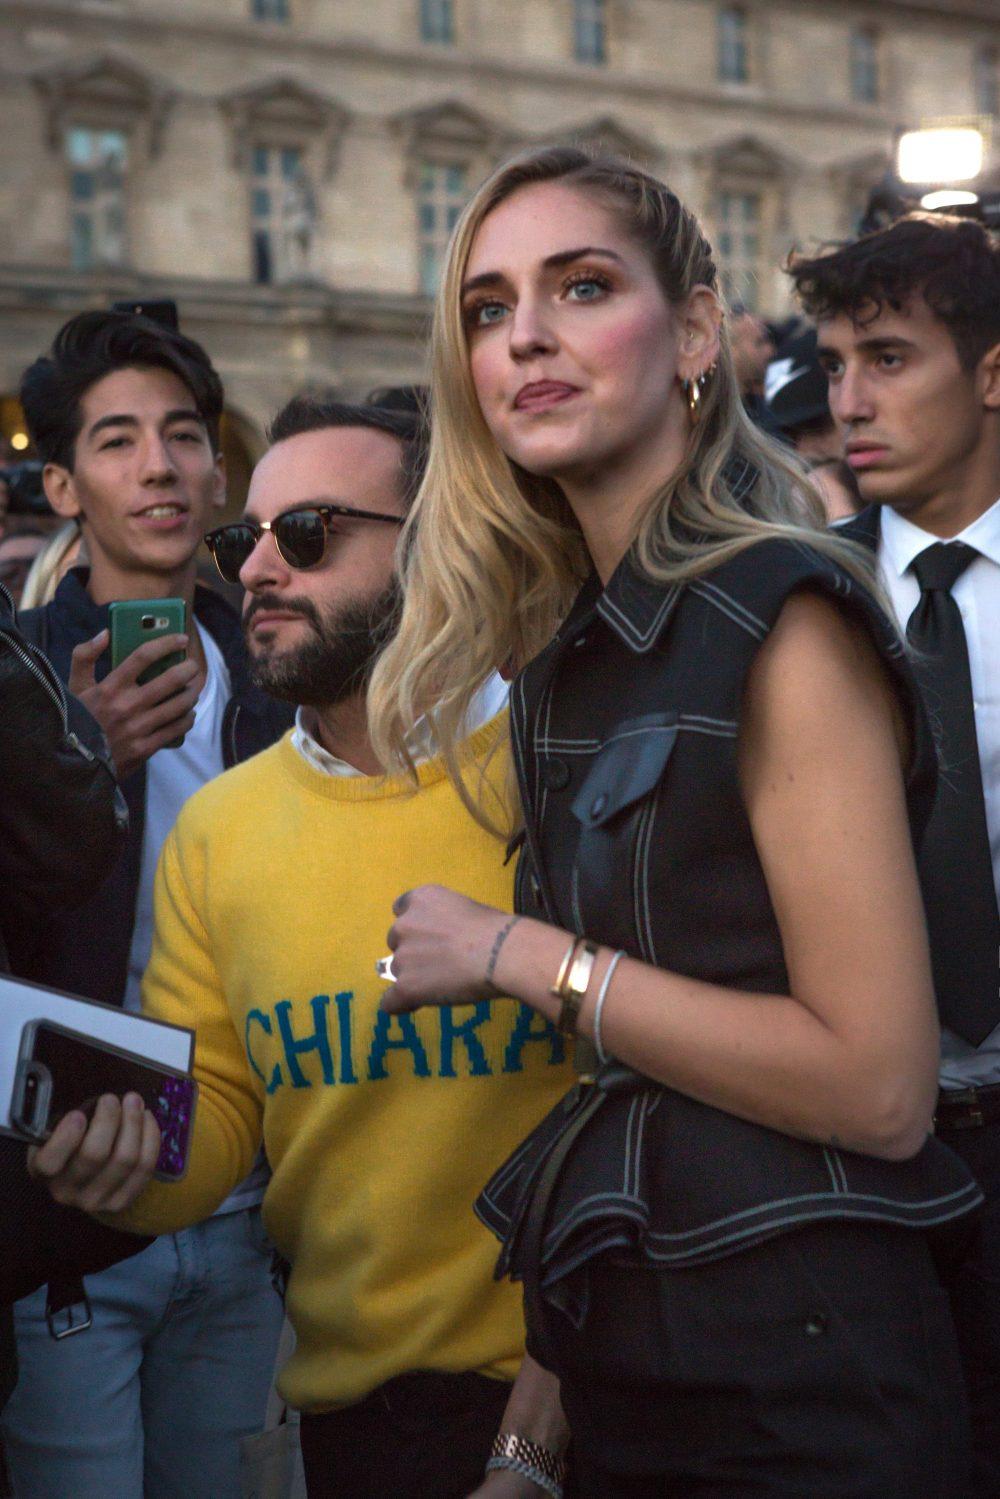 report_Paris_Fashion_Week_off_streetphotographer_guillaumedassonville_4